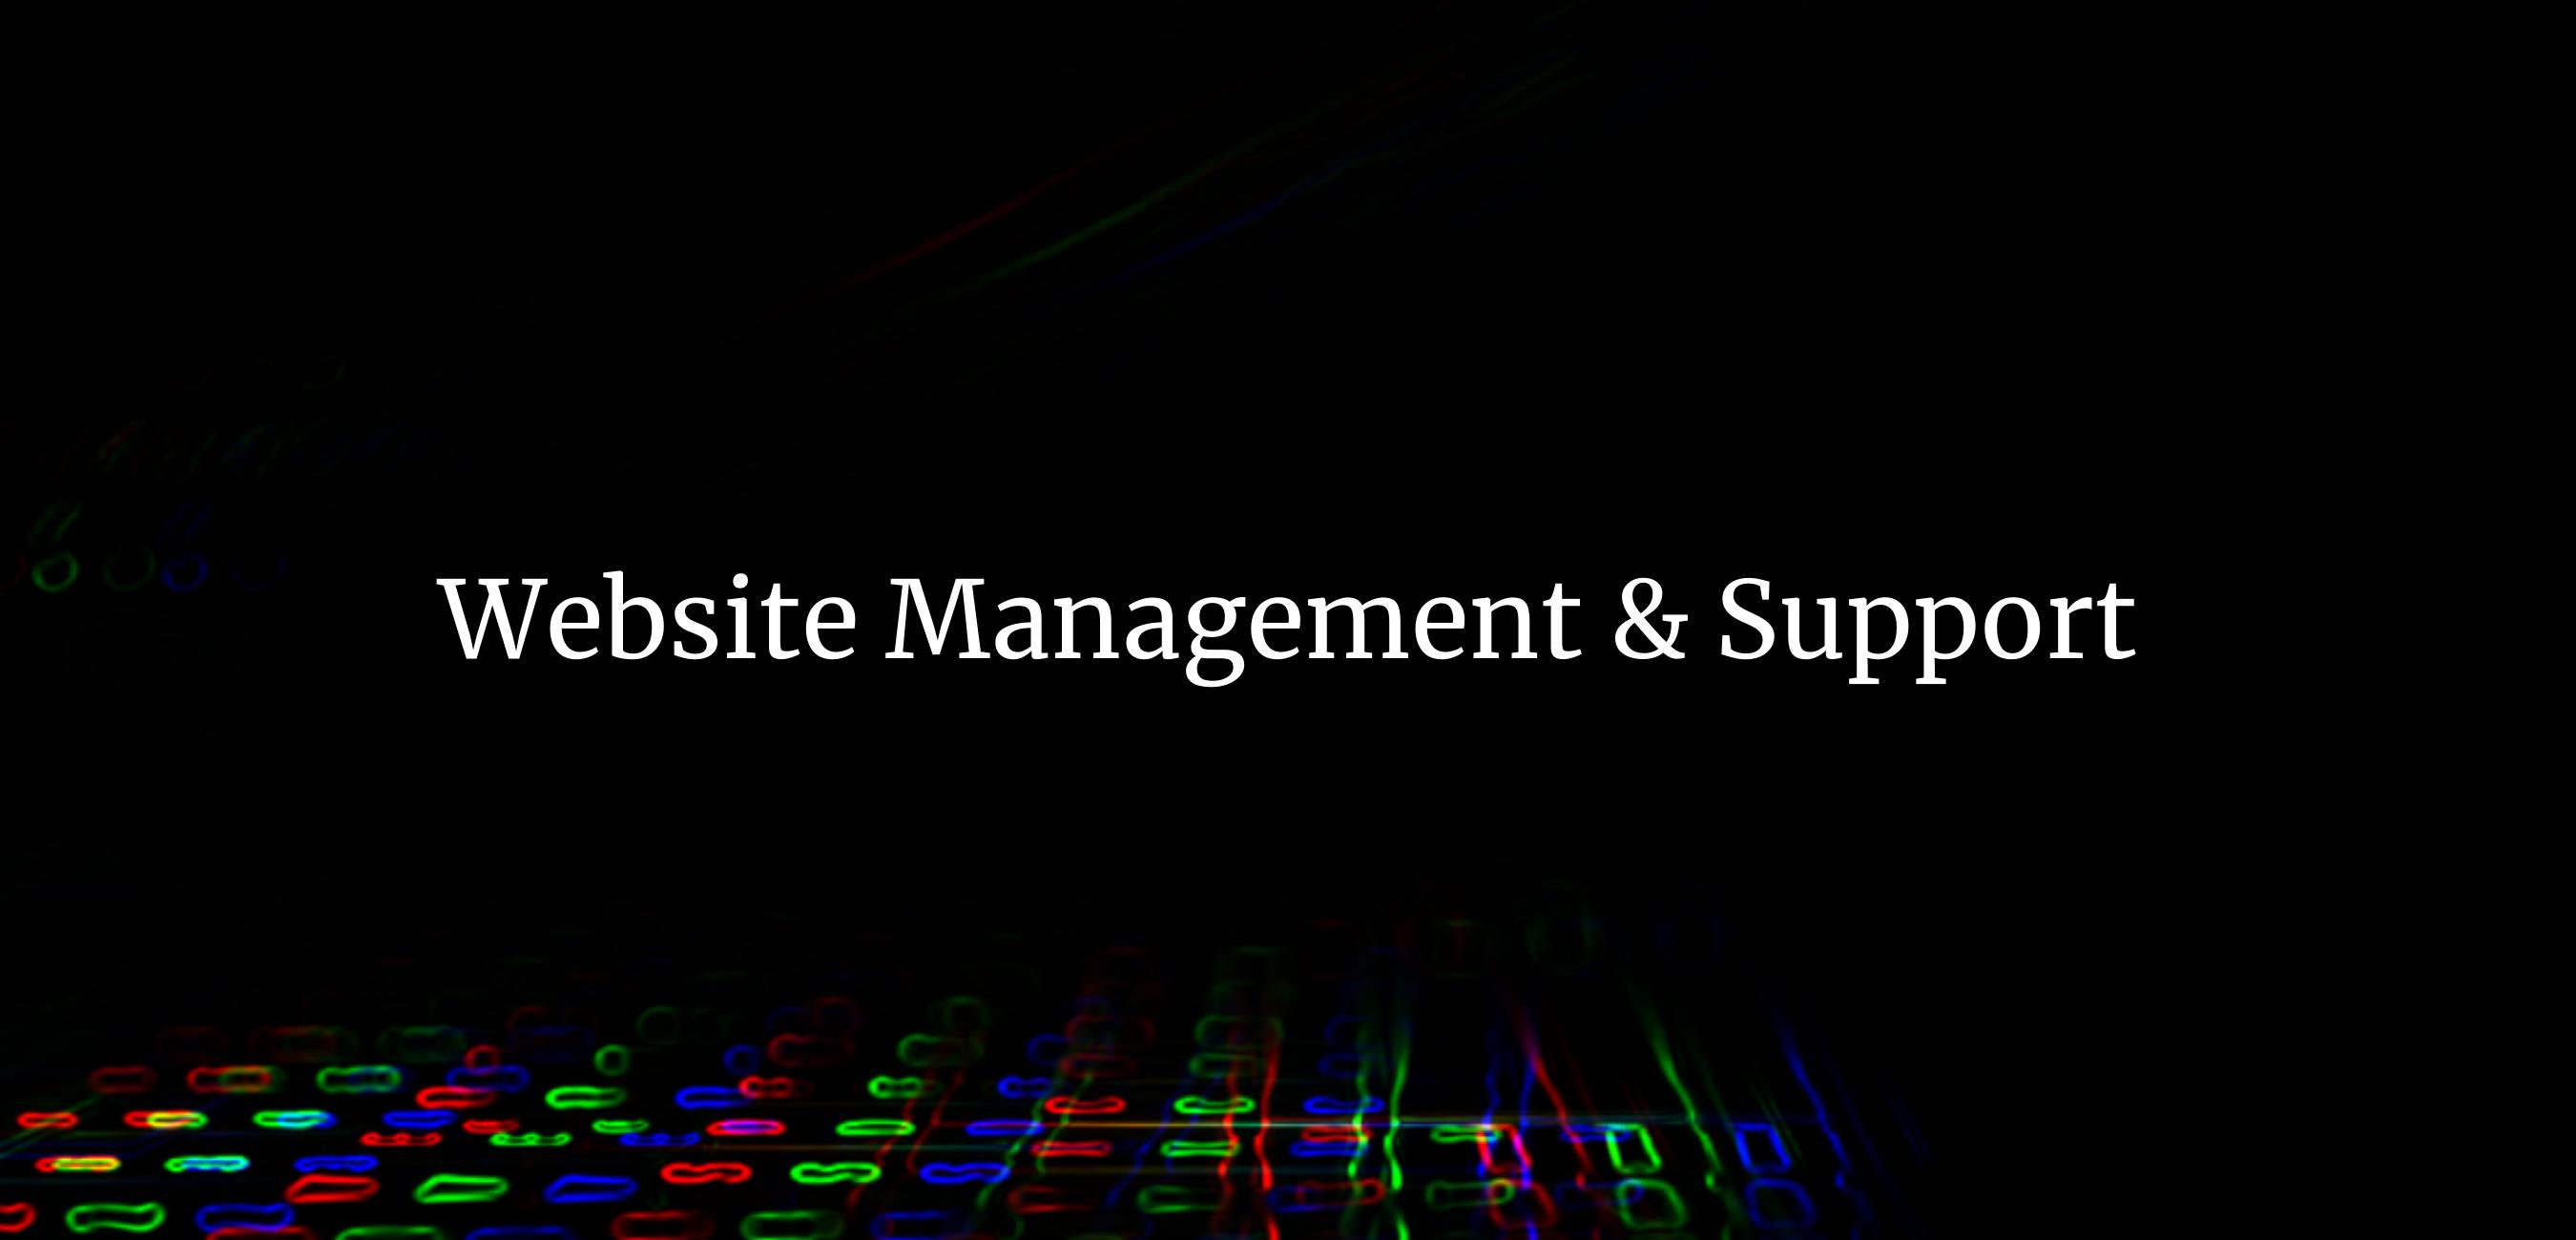 Website Management & Support (3)